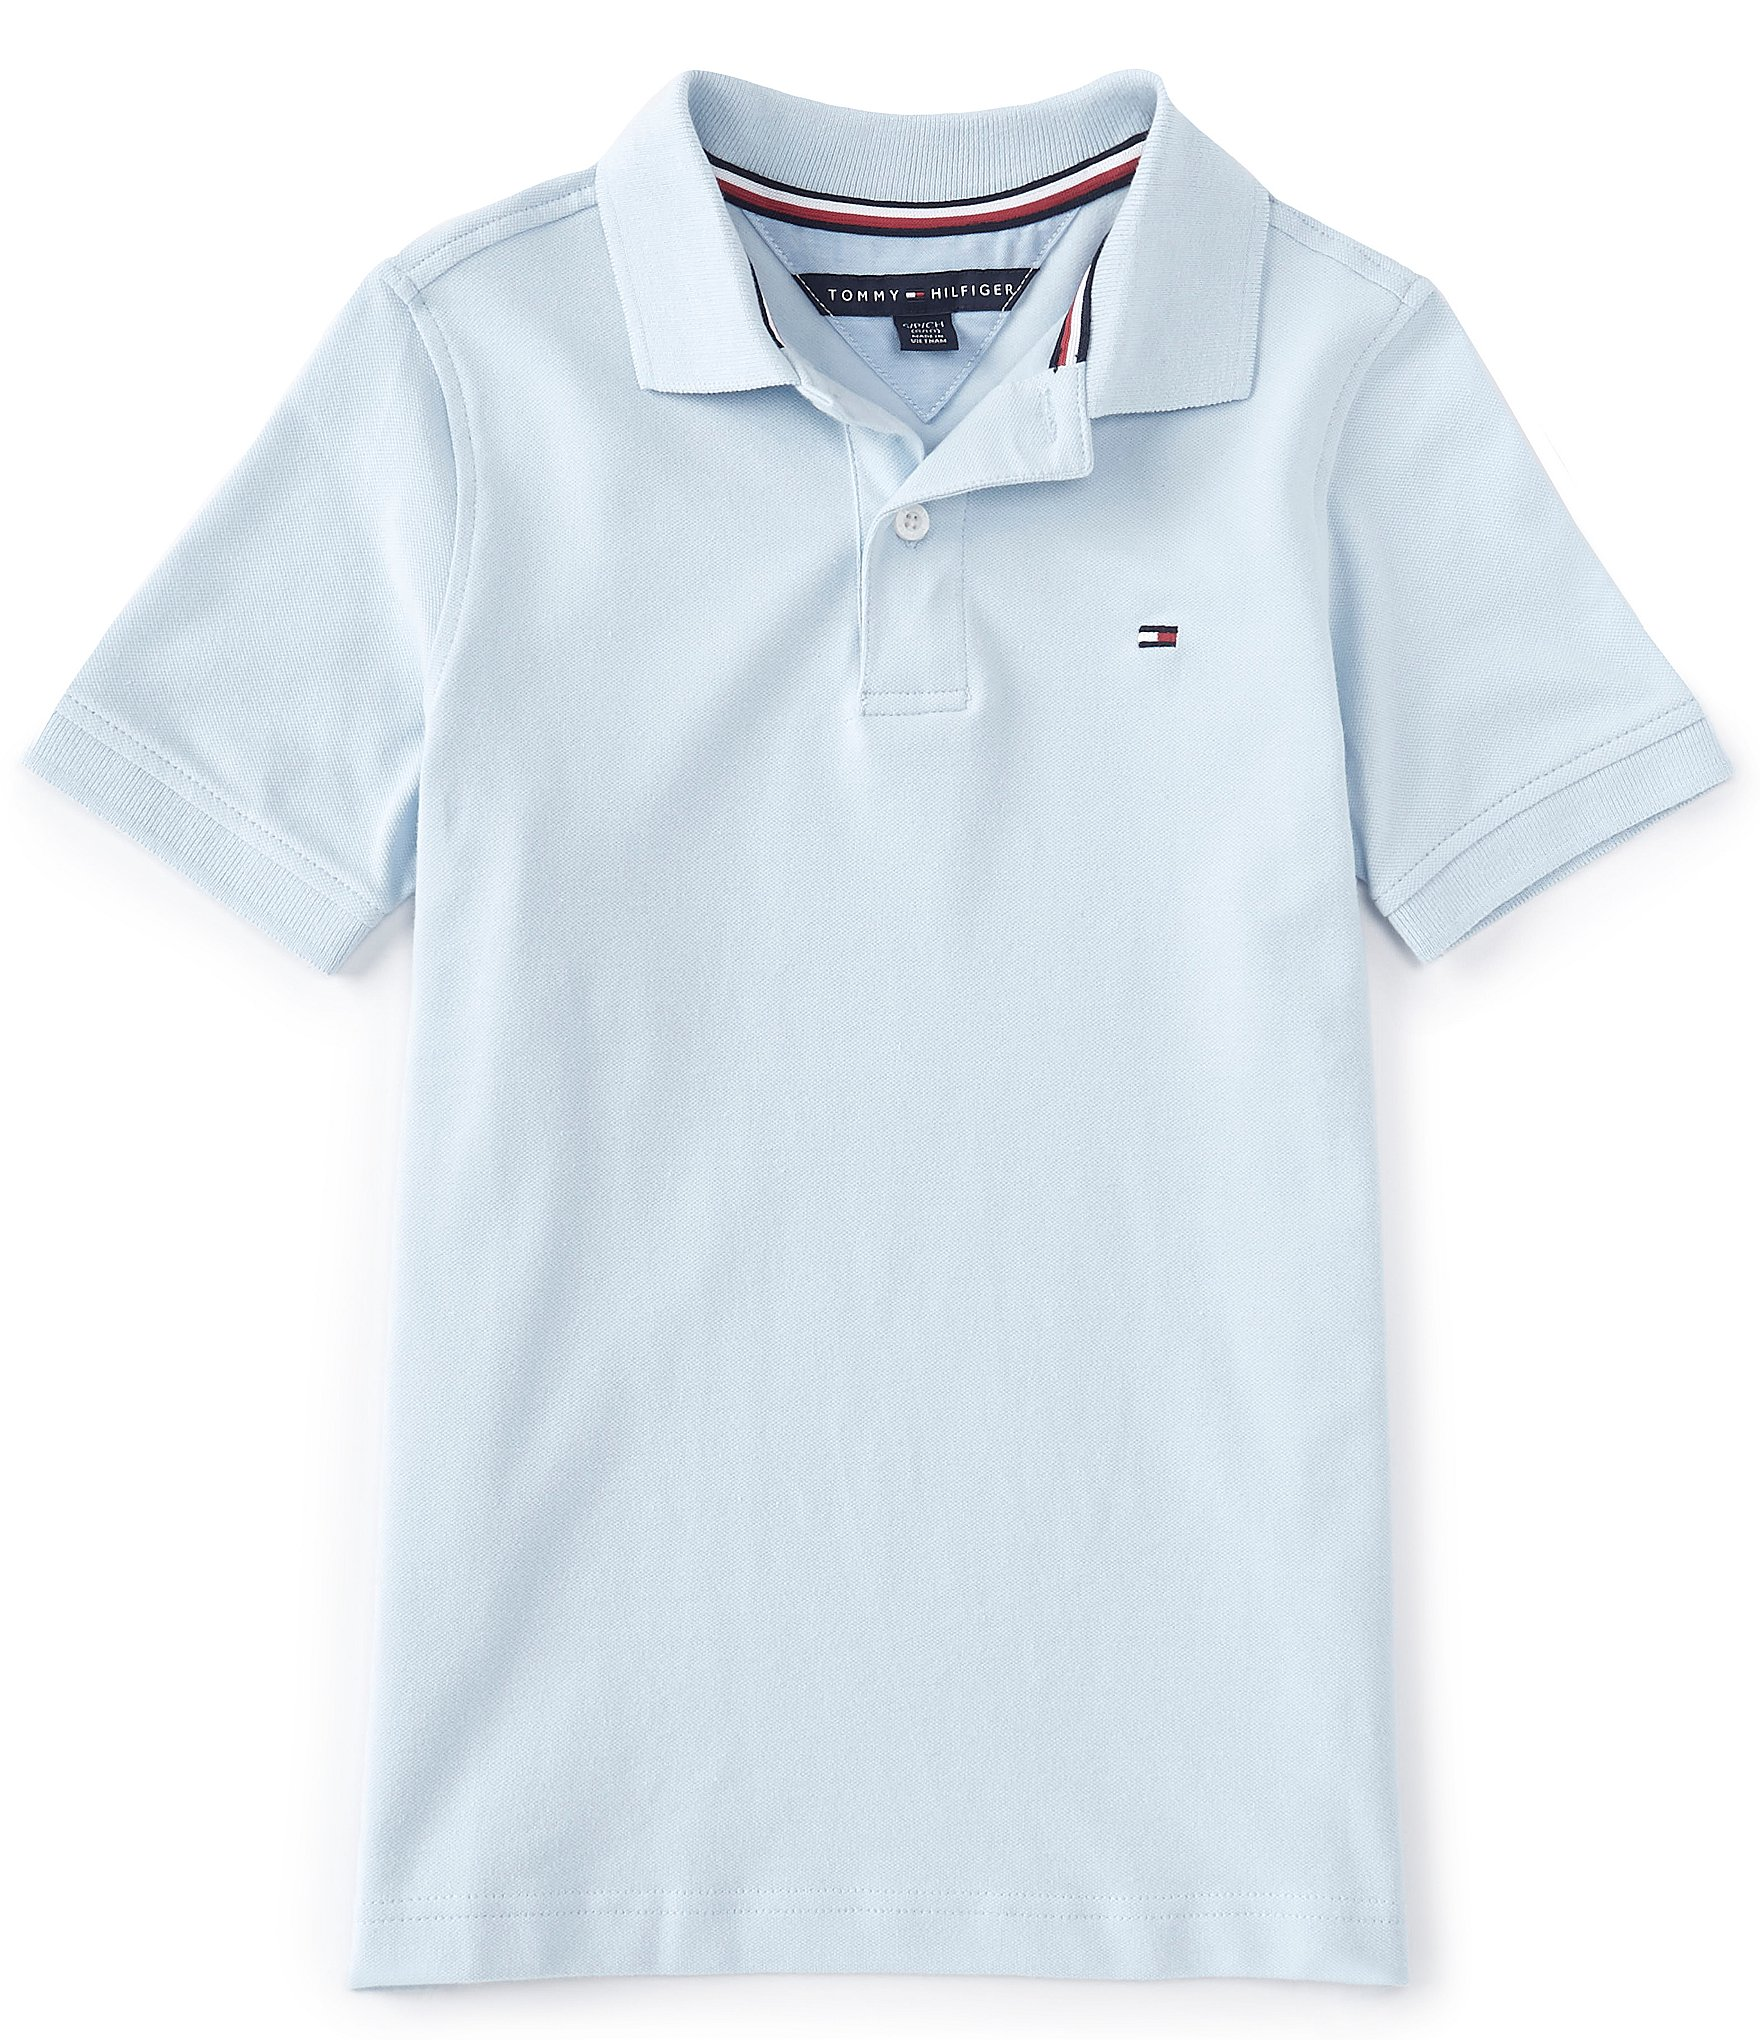 Tommy Hilfiger Boys Short Sleeve Ivy Polo